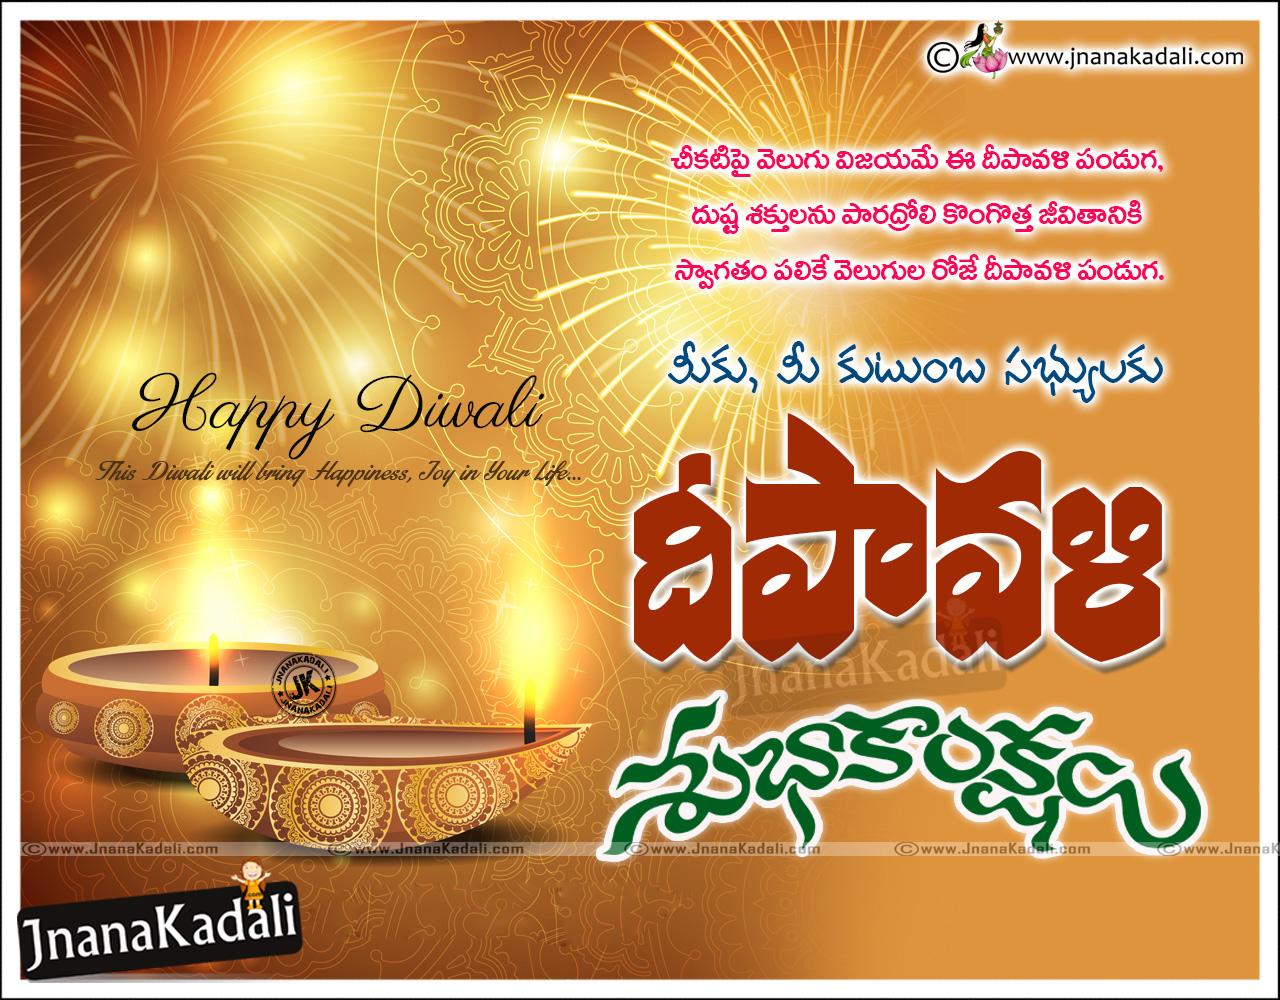 Telugu deepavali subhakankshalu diwali wishes quotes in telugu here is the latest online telugu diwali greetings with hd wallpapers diwali greetings in telugu narakachaturdashi wishes quotes in telugu online telugu kristyandbryce Gallery